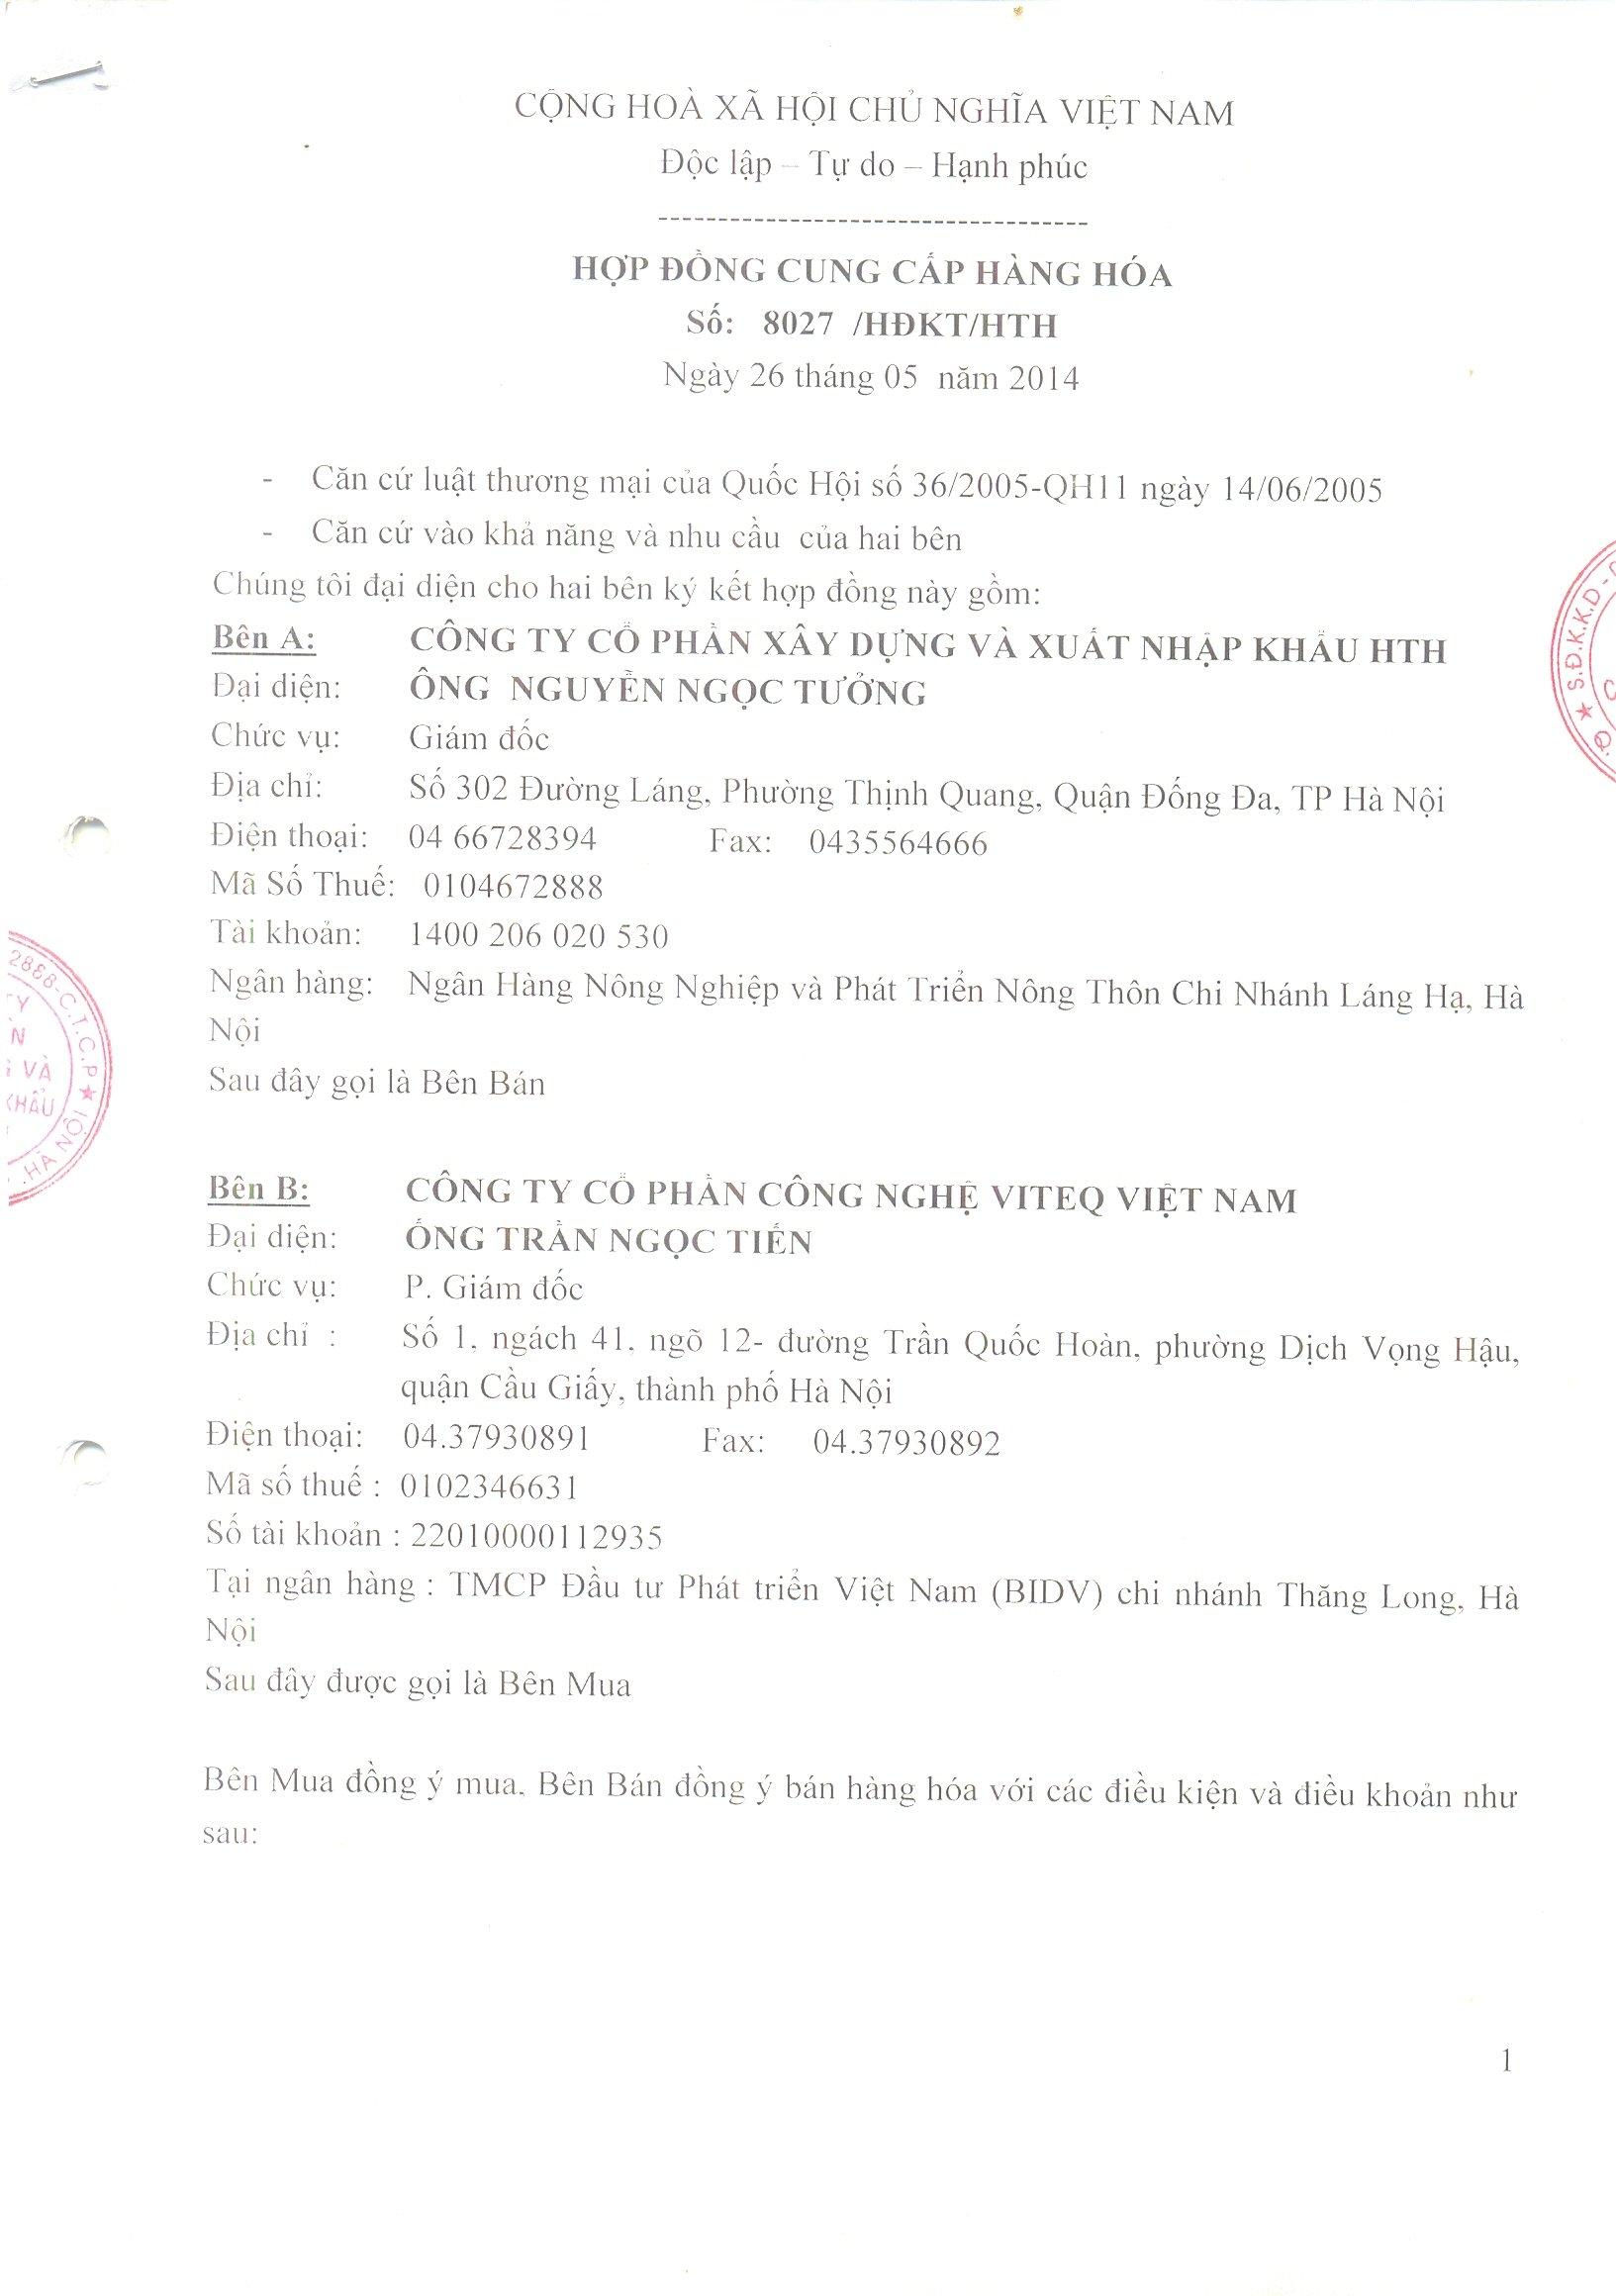 https://pccchanoi.com.vn/images/2014/10/Hop-dong-lap-dat-may-bom-phong-chay-chua-chay-cho-cty-cp-cong-nghe-VITEQ-Viet-Nam.jpg